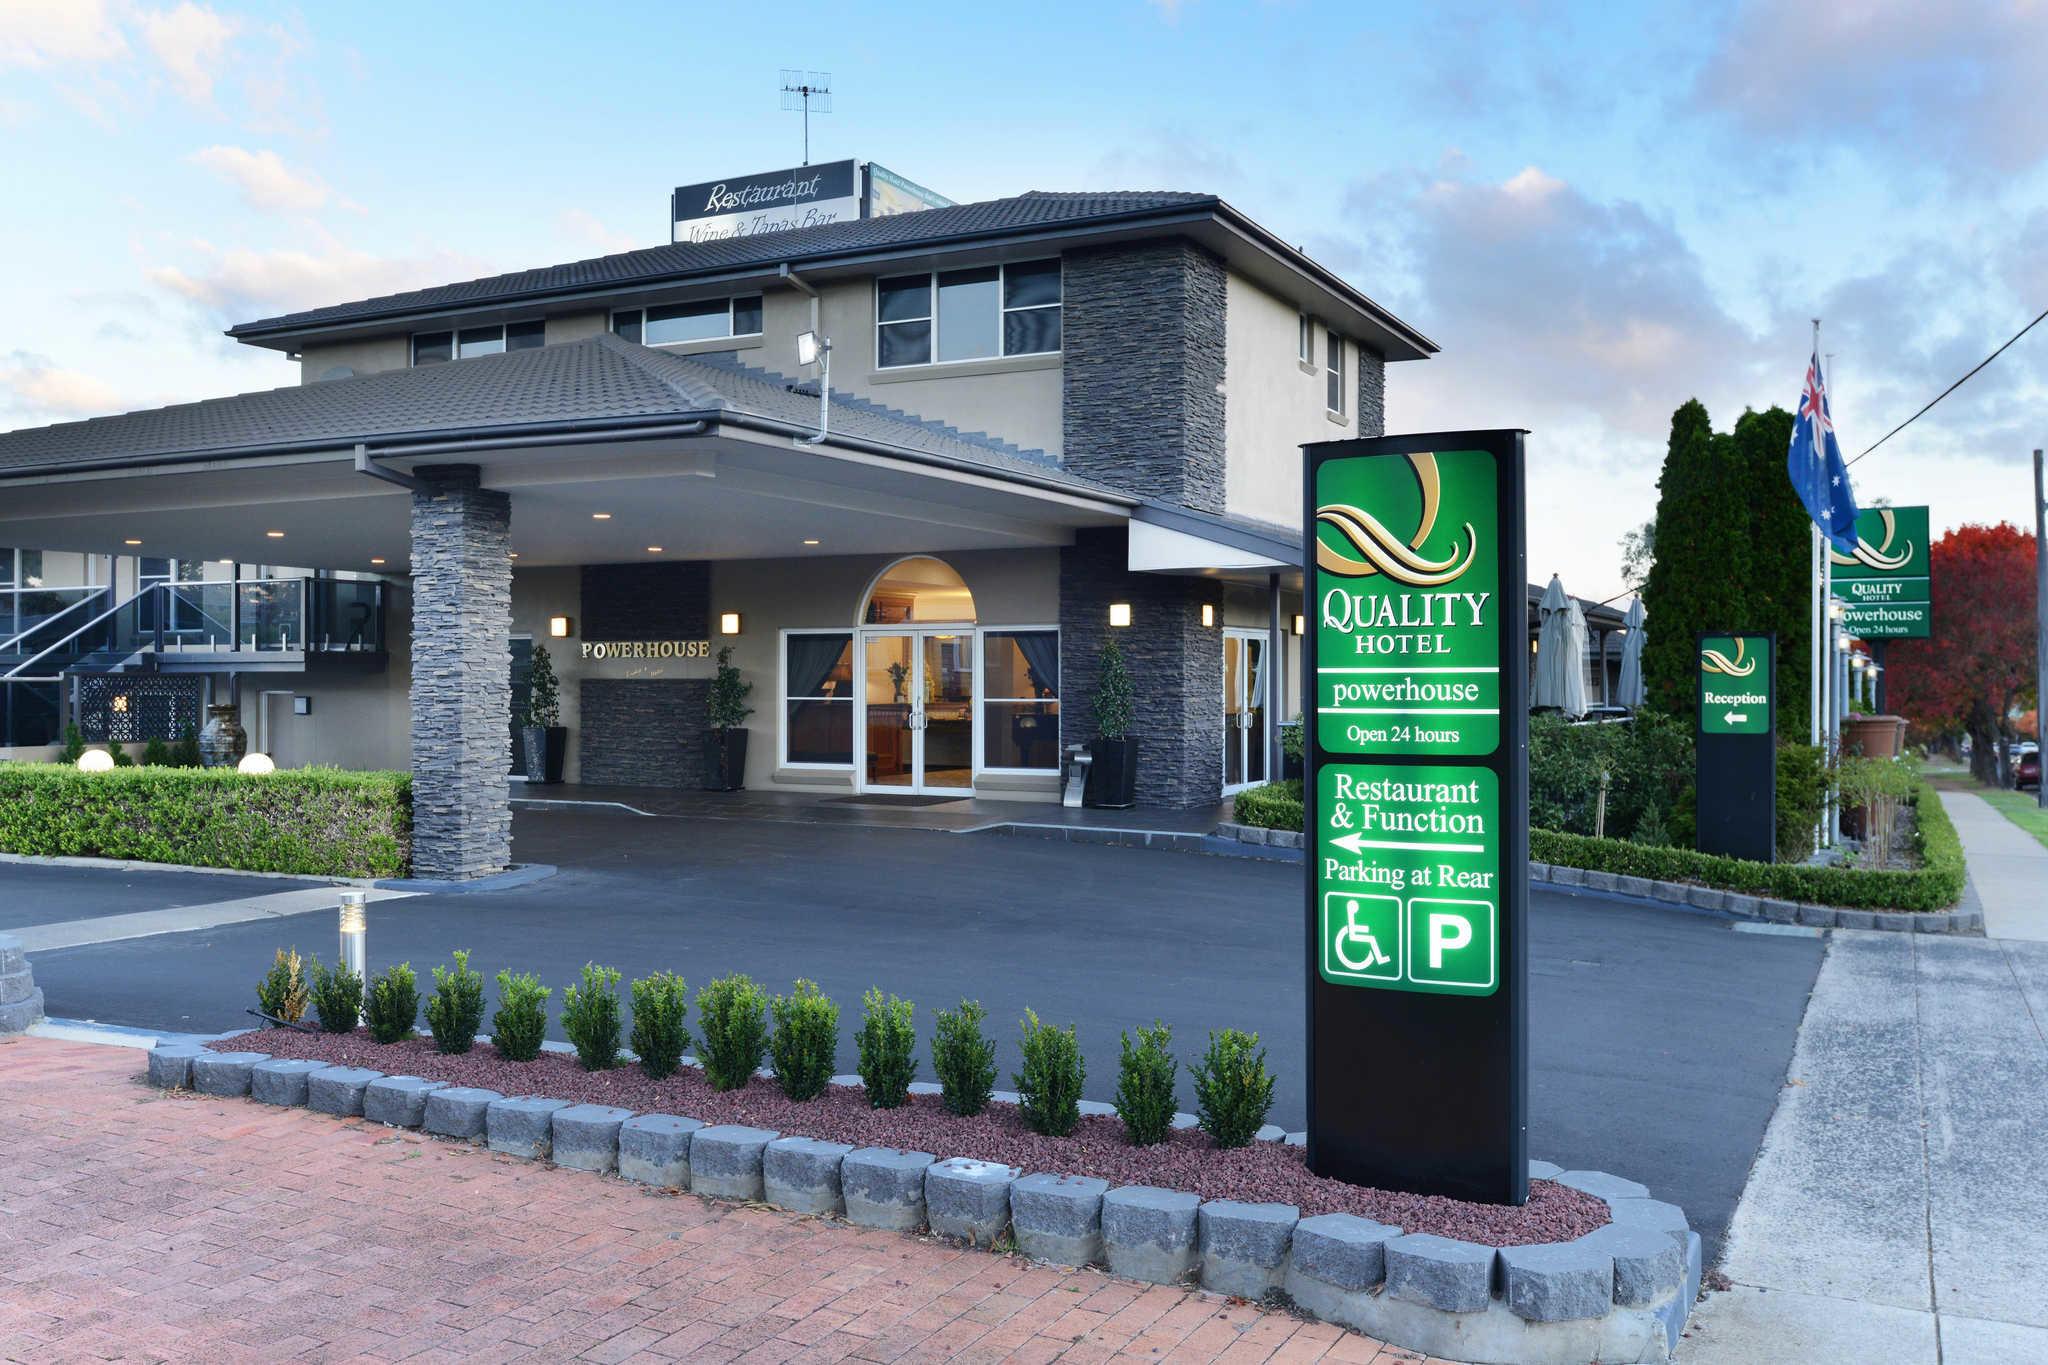 Quality Hotel Powerhouse Armidale - Closed